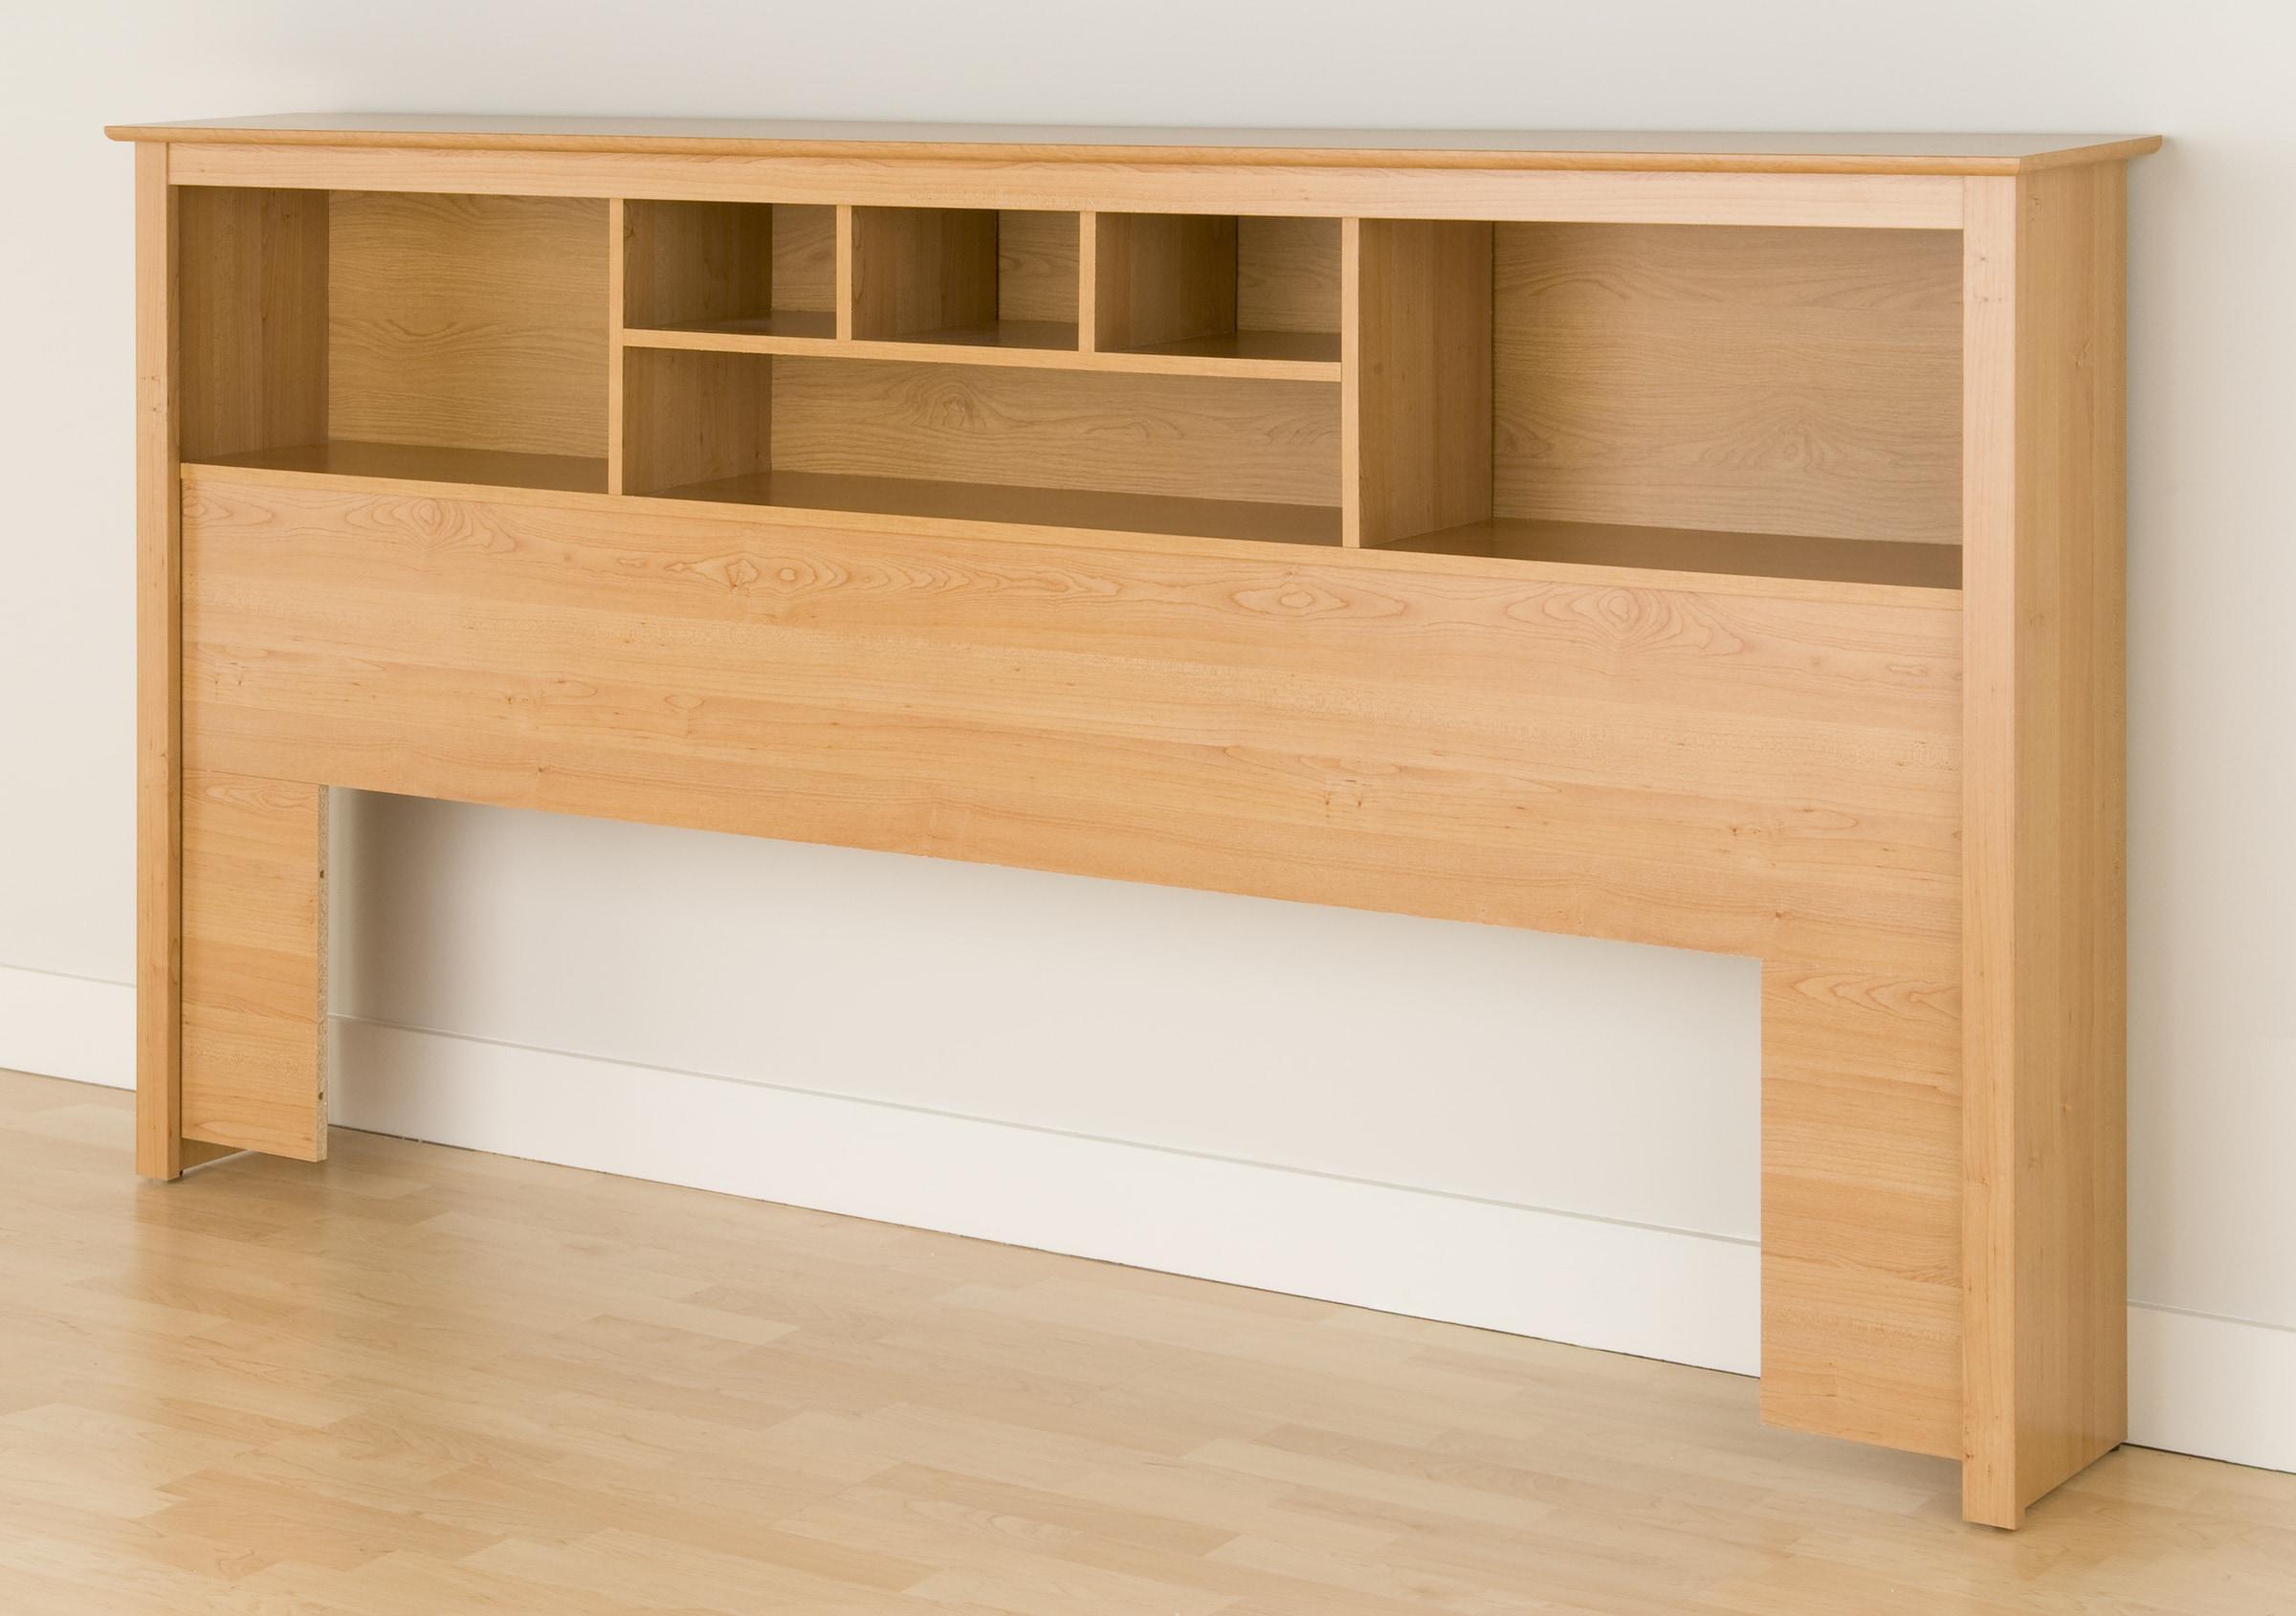 montego maple king bookcase headboard 11127143 shopping big discounts on. Black Bedroom Furniture Sets. Home Design Ideas